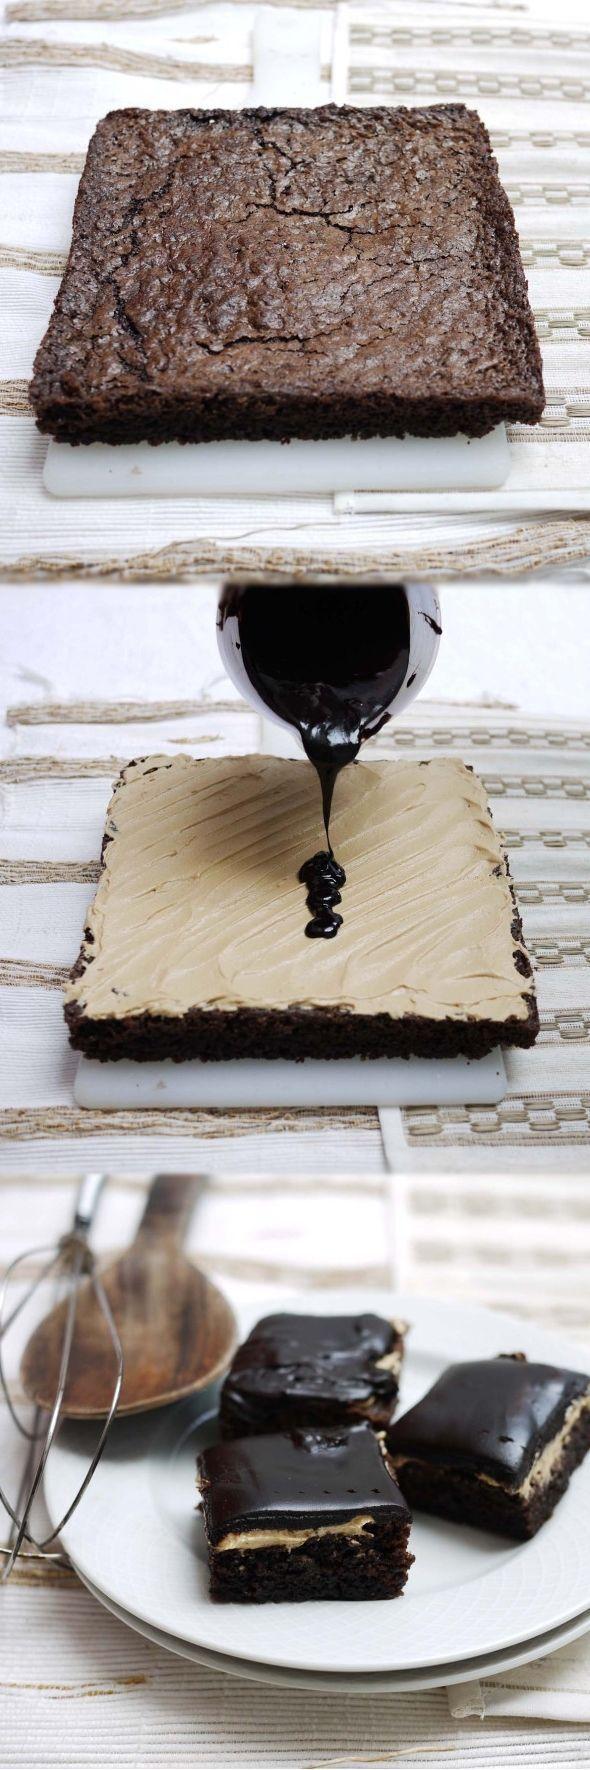 Coffee Cream Brownies: A yummy treat for coffee and chocolate lovers.